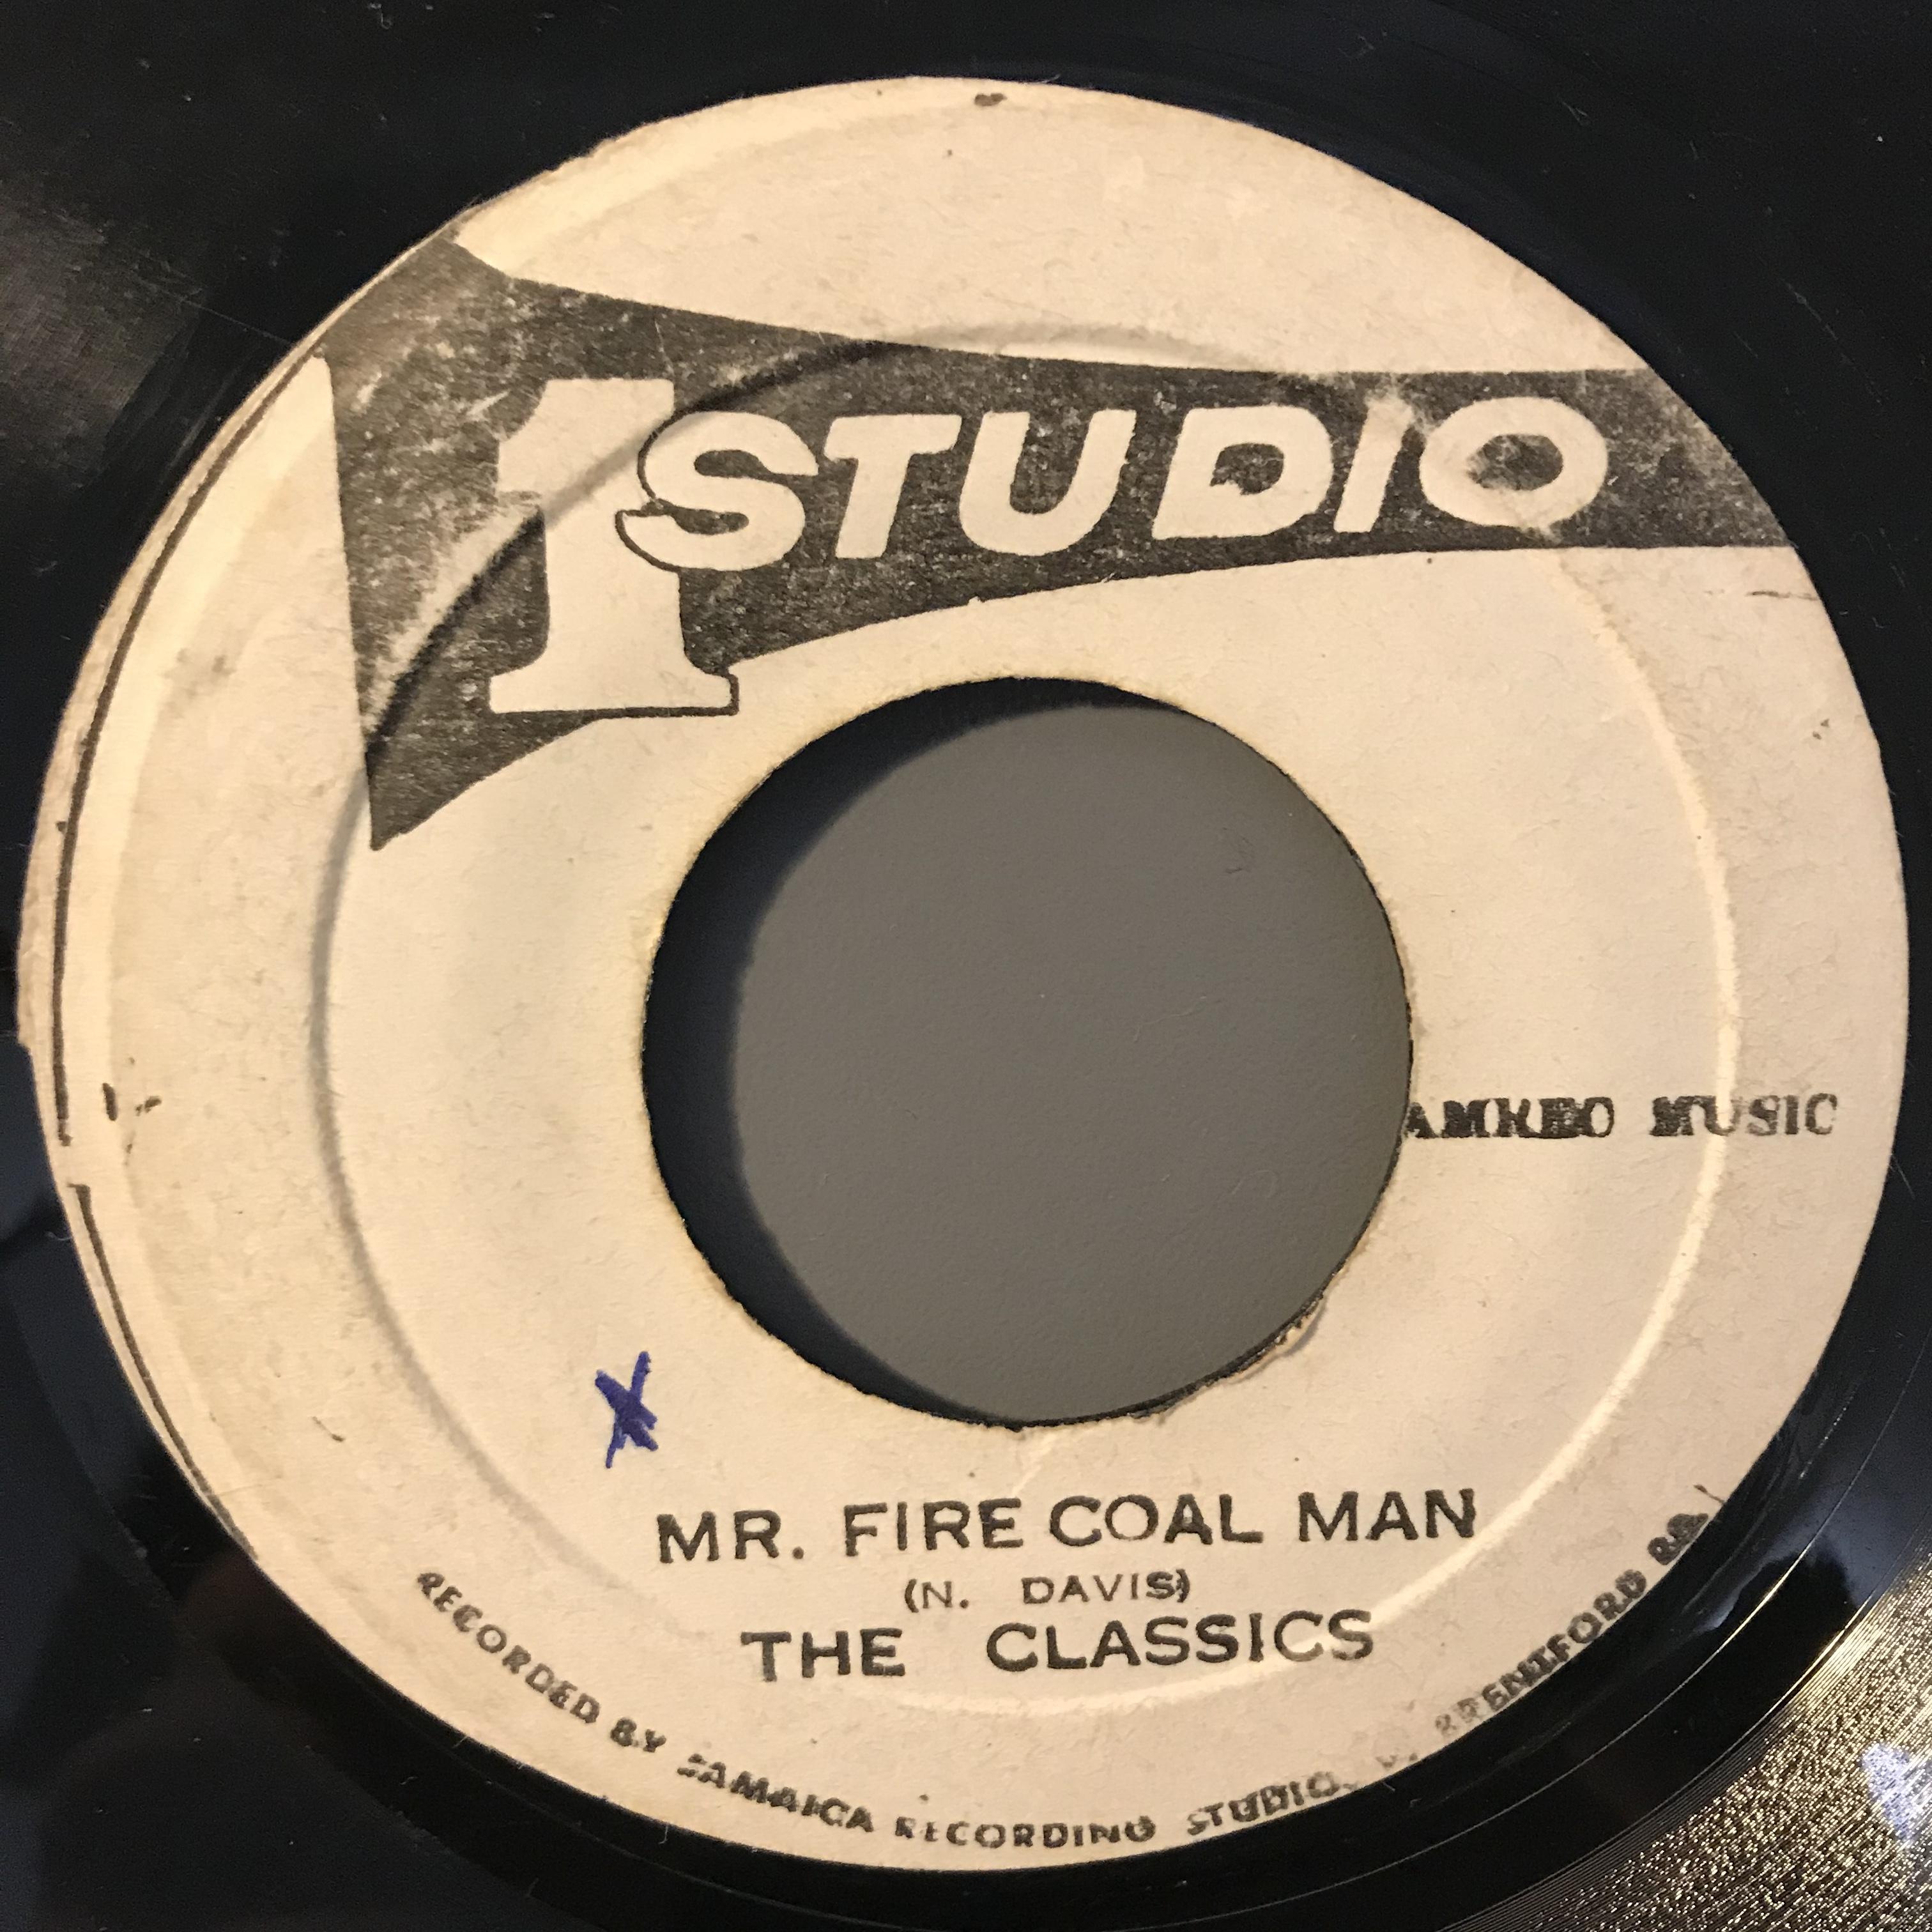 The Classics - Mr. Fire Coal Man【7-10826】